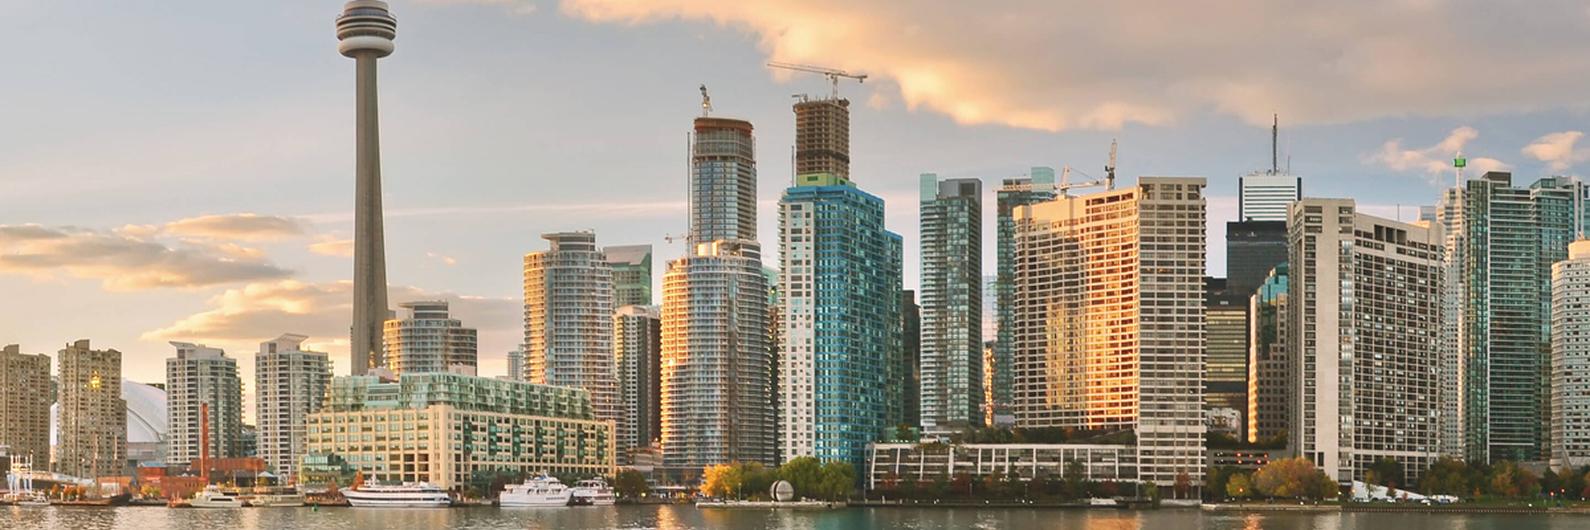 Toronto: o outro lado do centro financeiro do Canadá